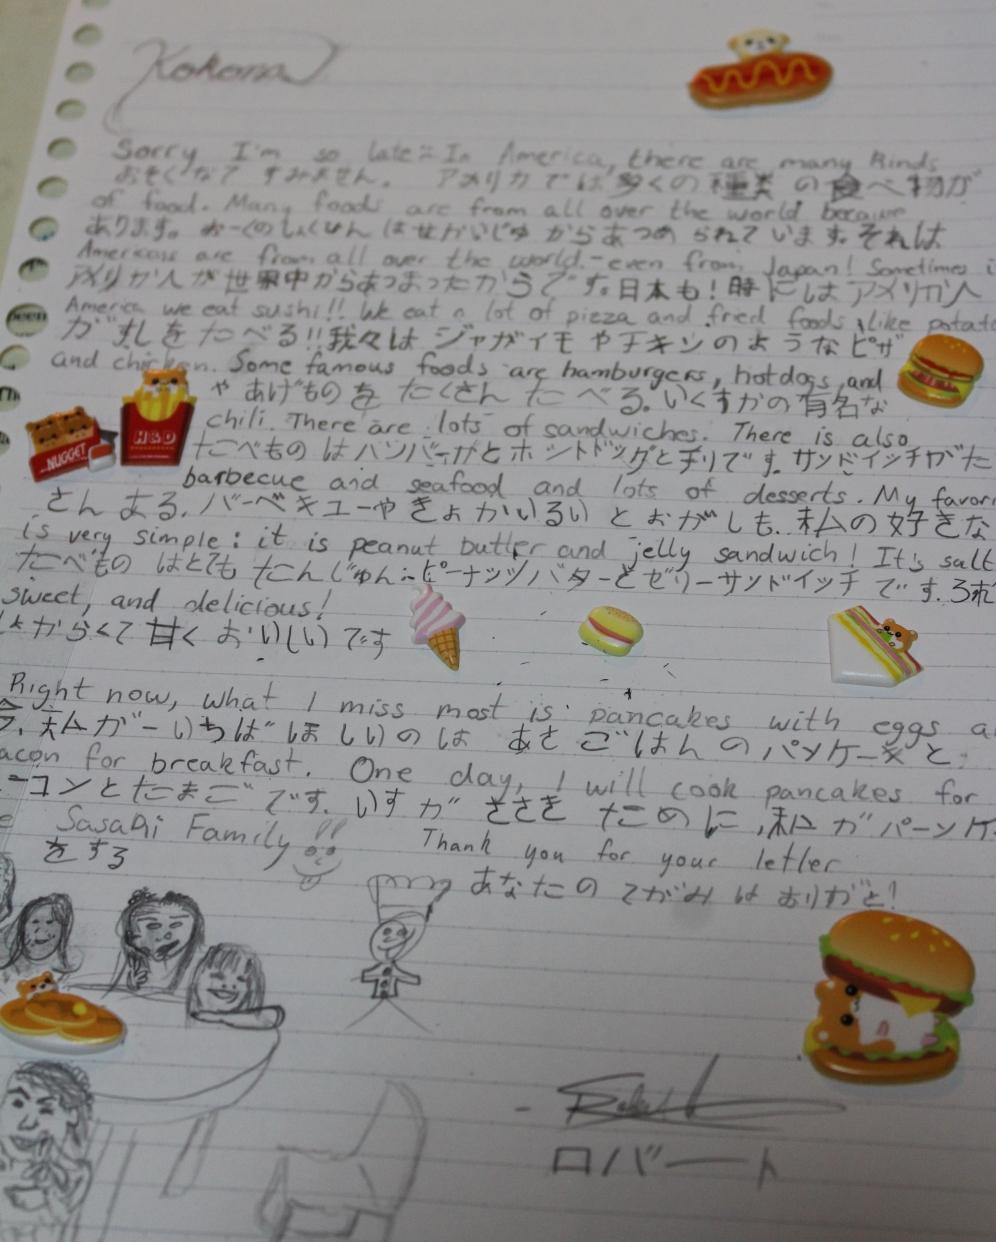 letter to kokona (1)